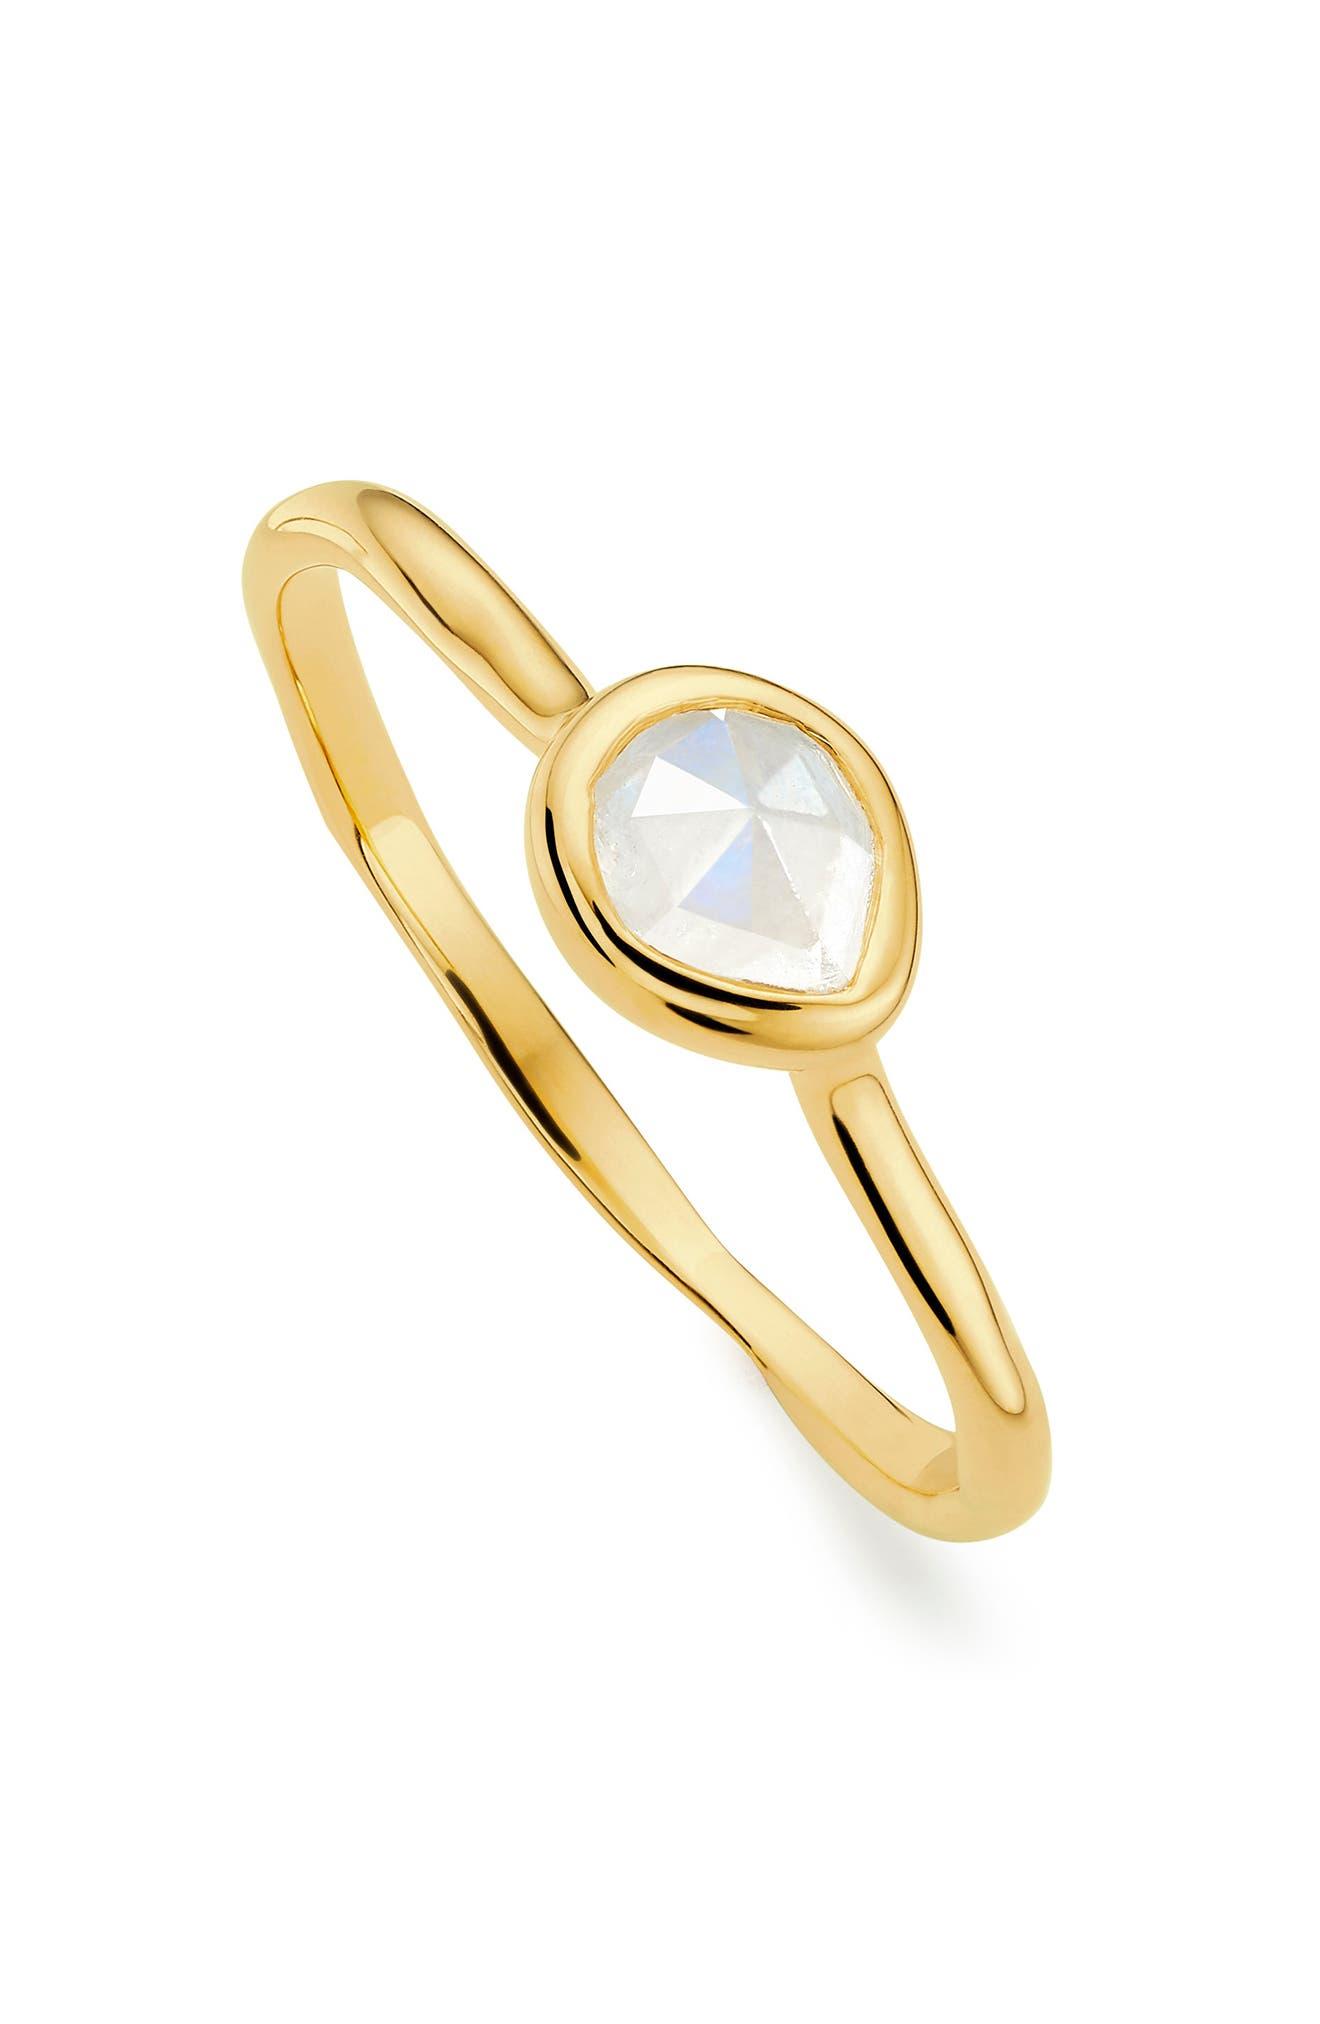 MONICA VINADER, Siren Small Semiprecious Stone Stacking Ring, Alternate thumbnail 5, color, GOLD/ MOONSTONE